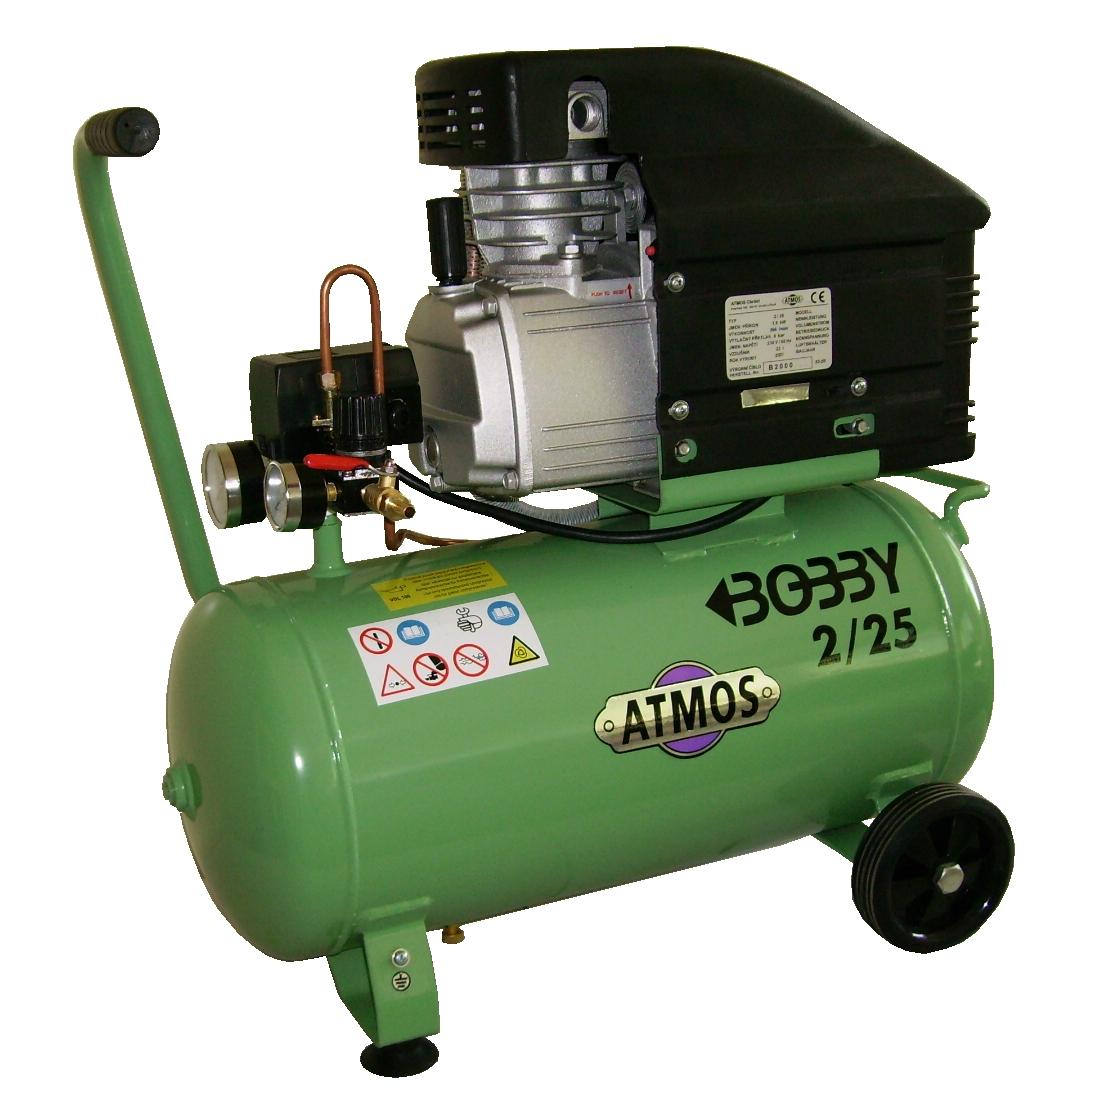 AKCE! Kompresor Atmos Bobby 2/25